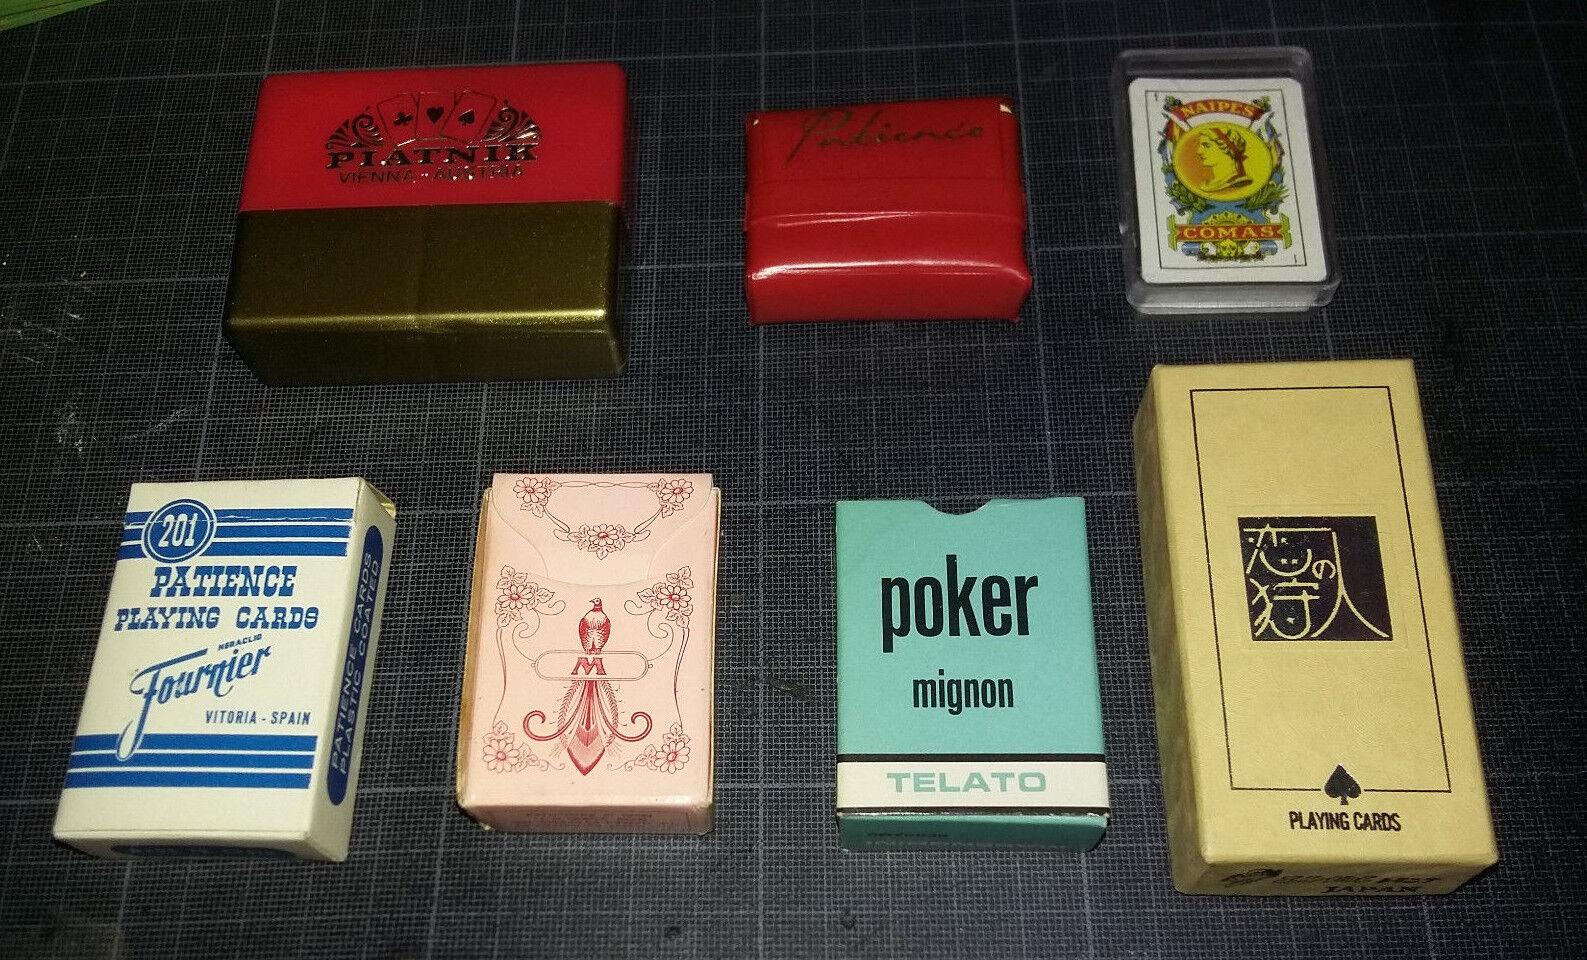 Lot 7 Mini jeux de autote -  Piatnik - Fournier - Muller -  Comas - Telato - neufs  più economico